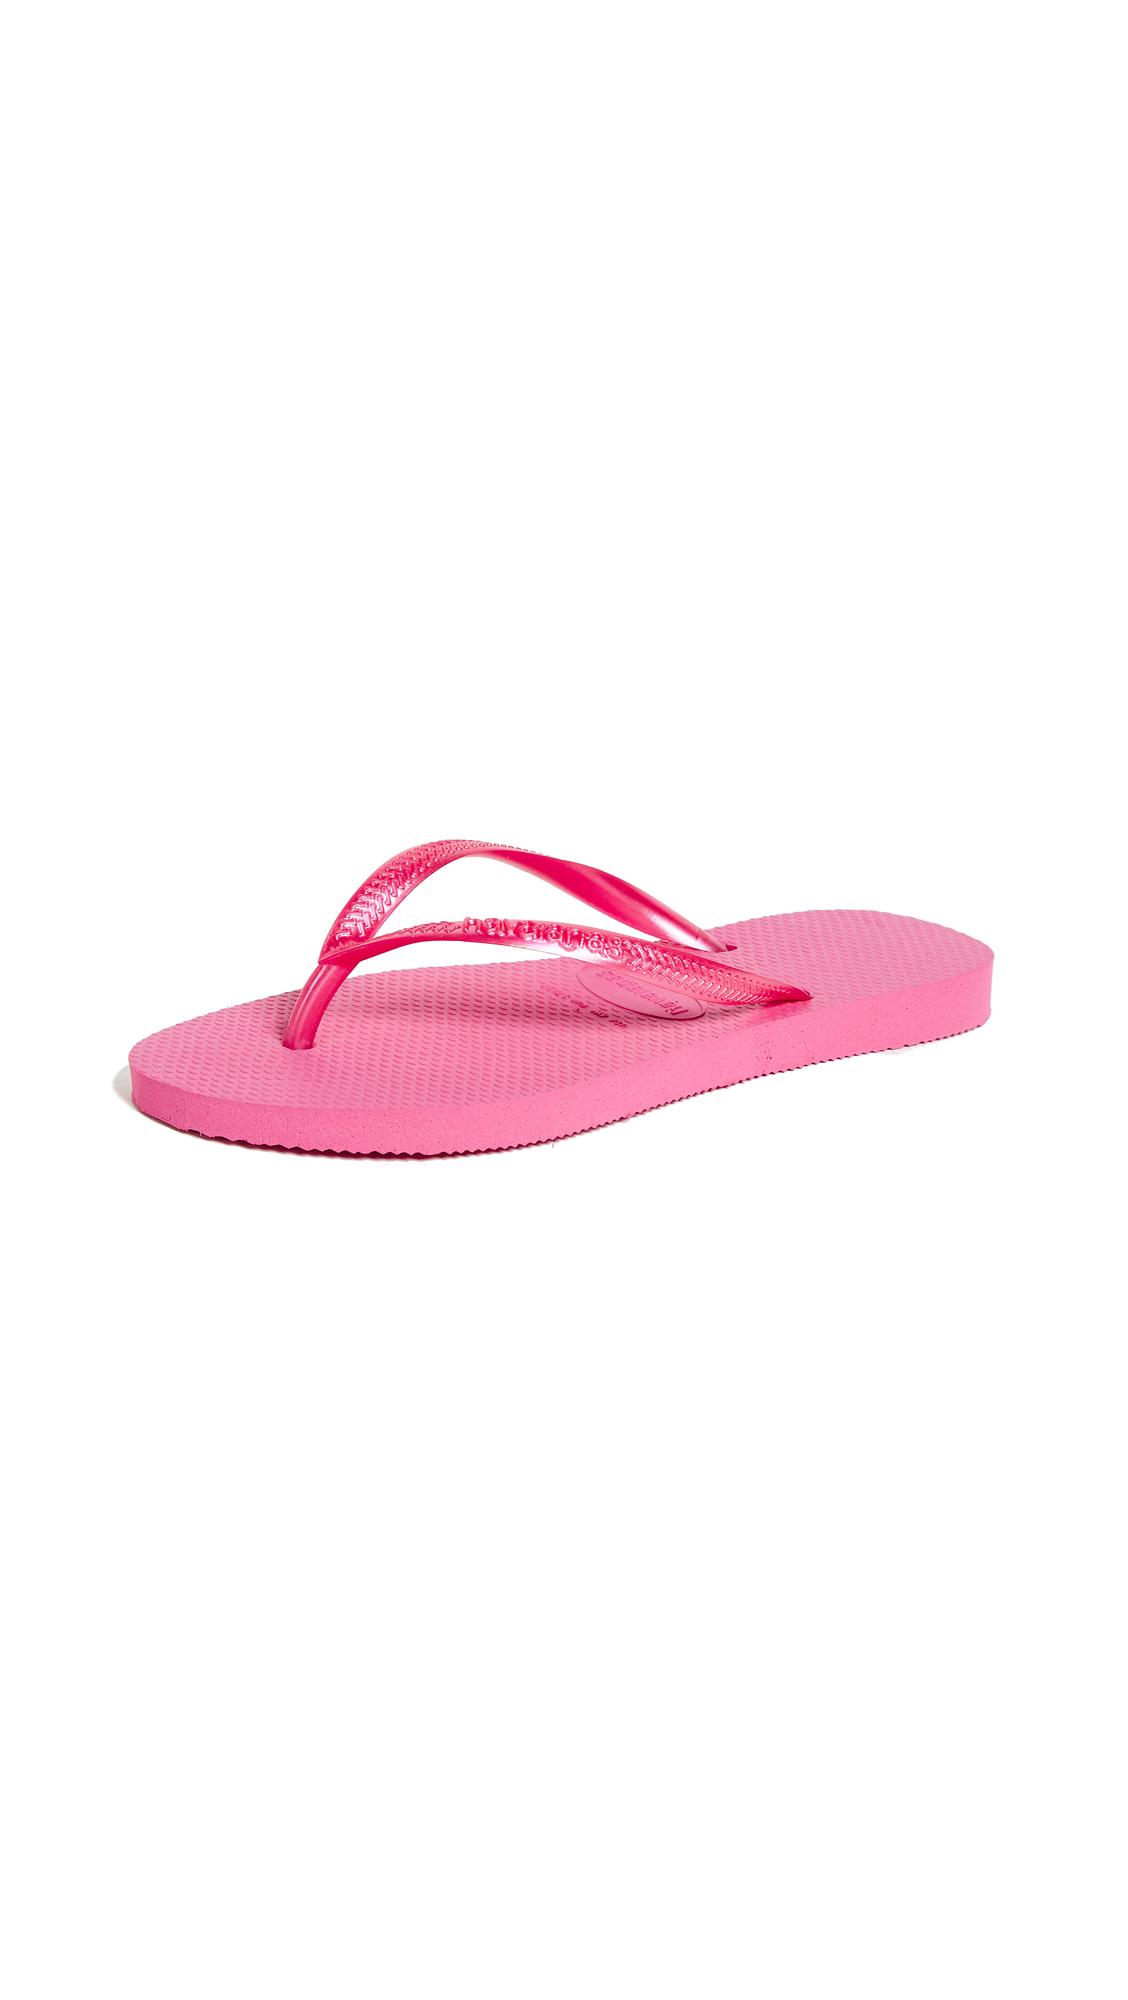 Havaianas Slim Flip Flops - Shocking Pink